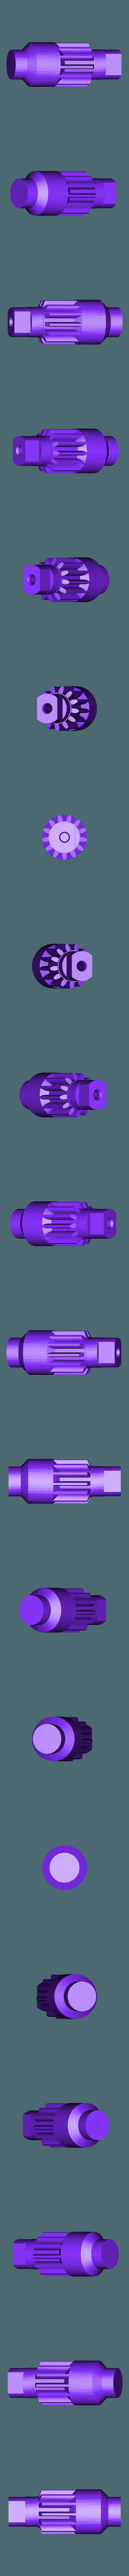 Truck_V4_Centerdiff_Inputgear.STL Download STL file 3D Printed Rc Truck V4 • 3D printable template, MrCrankyface